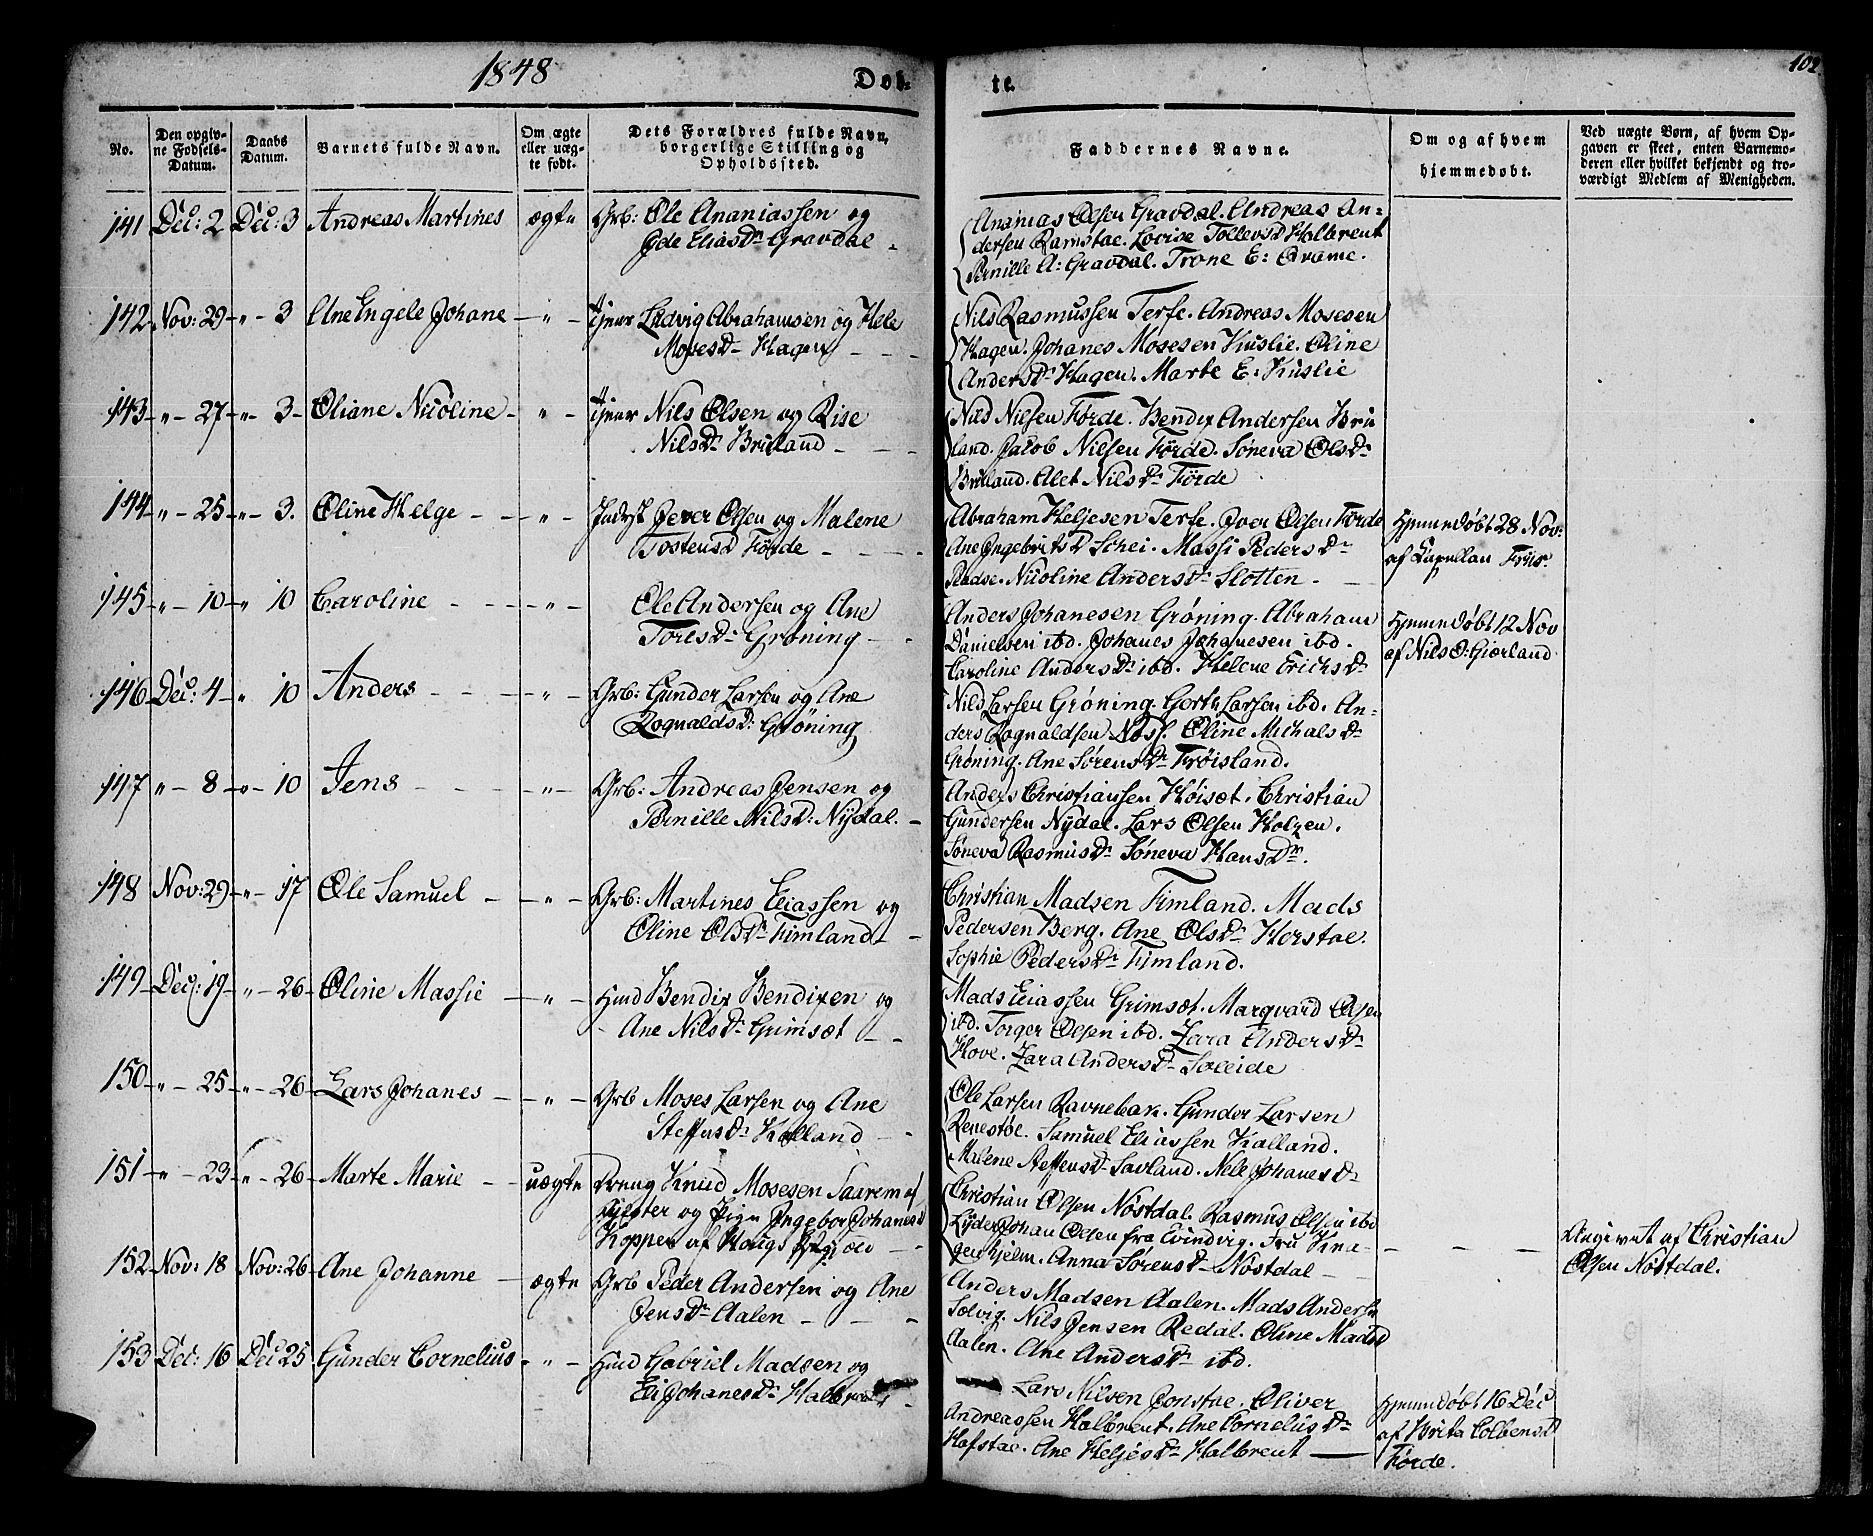 SAB, Førde sokneprestembete, H/Haa: Ministerialbok nr. A 7, 1843-1860, s. 102